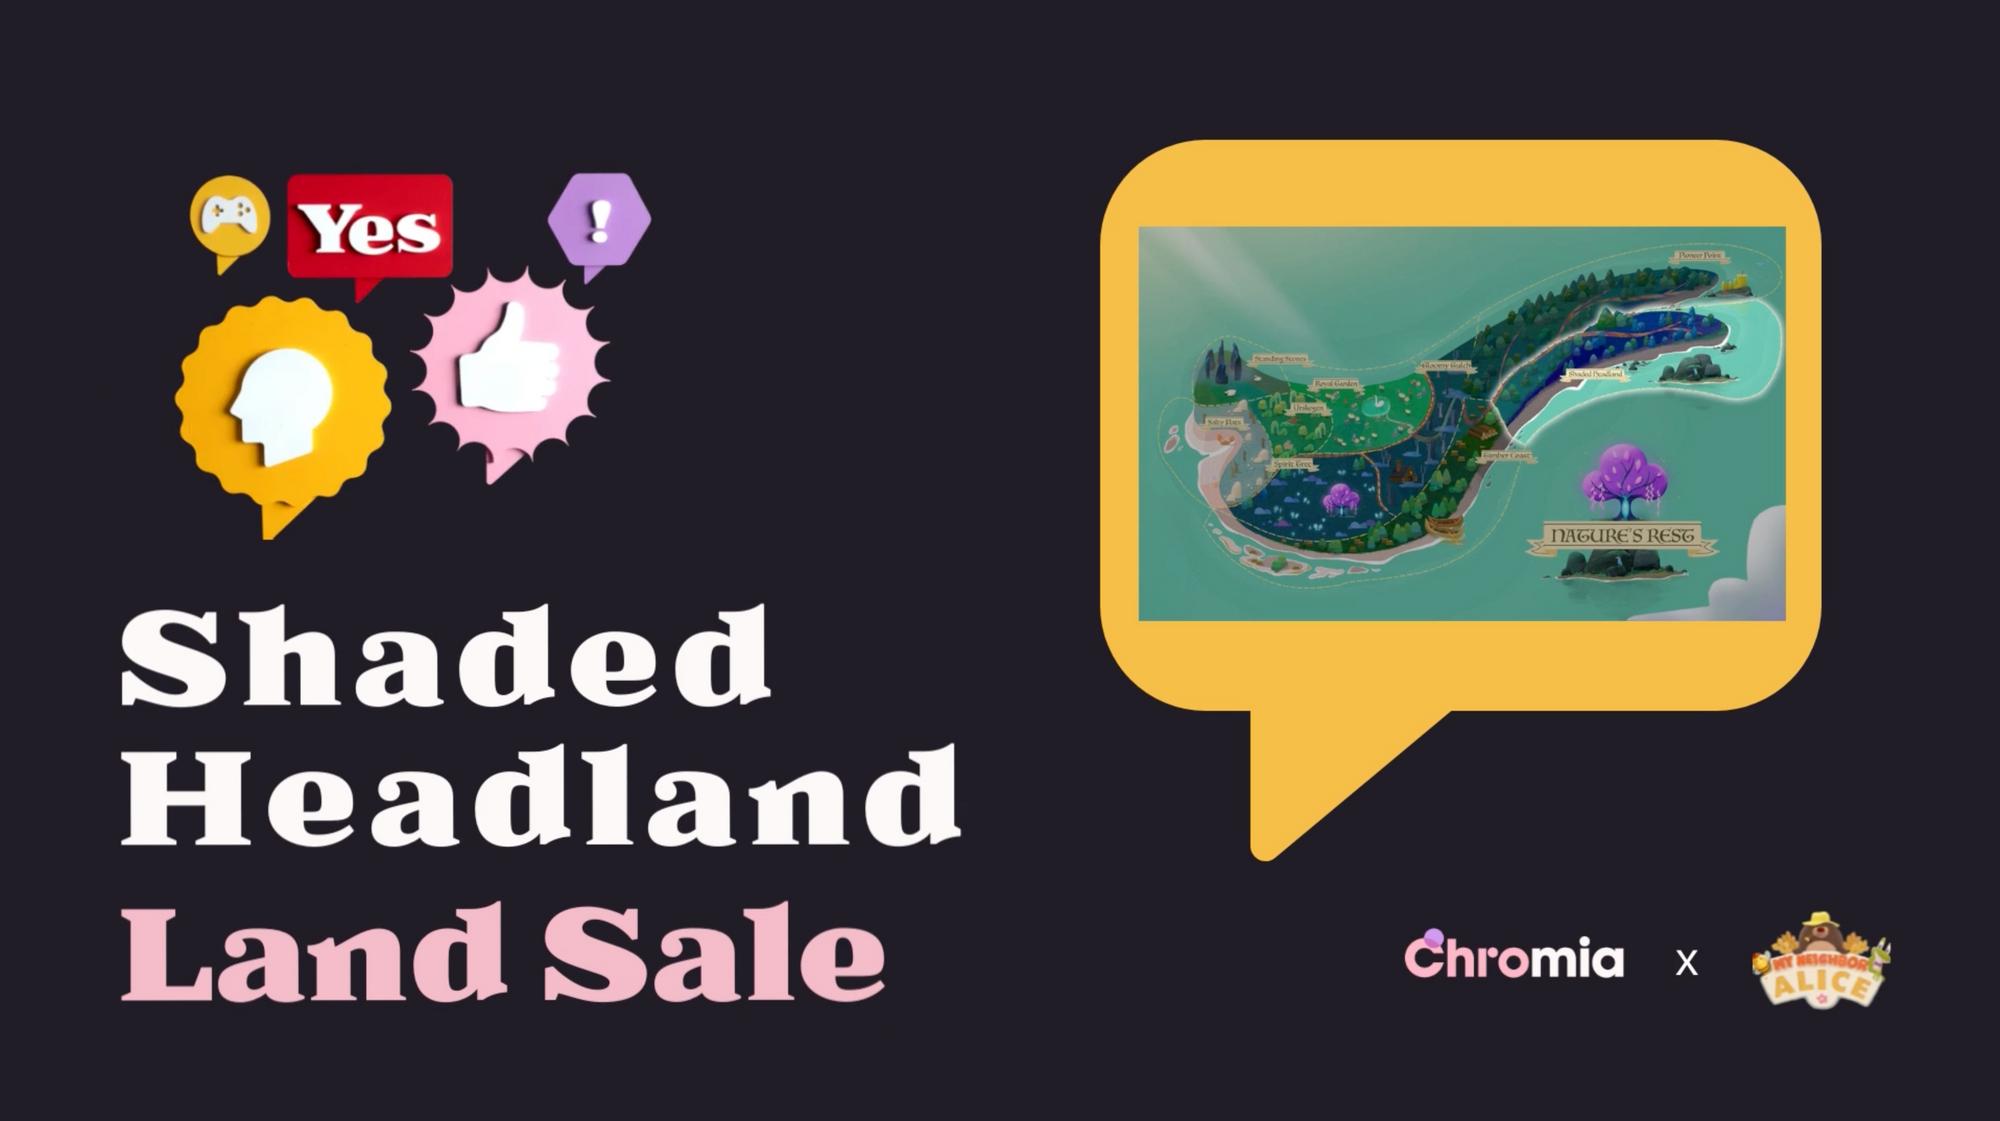 My Neighbor Alice Announces Second Land Sale - Shaded Headland